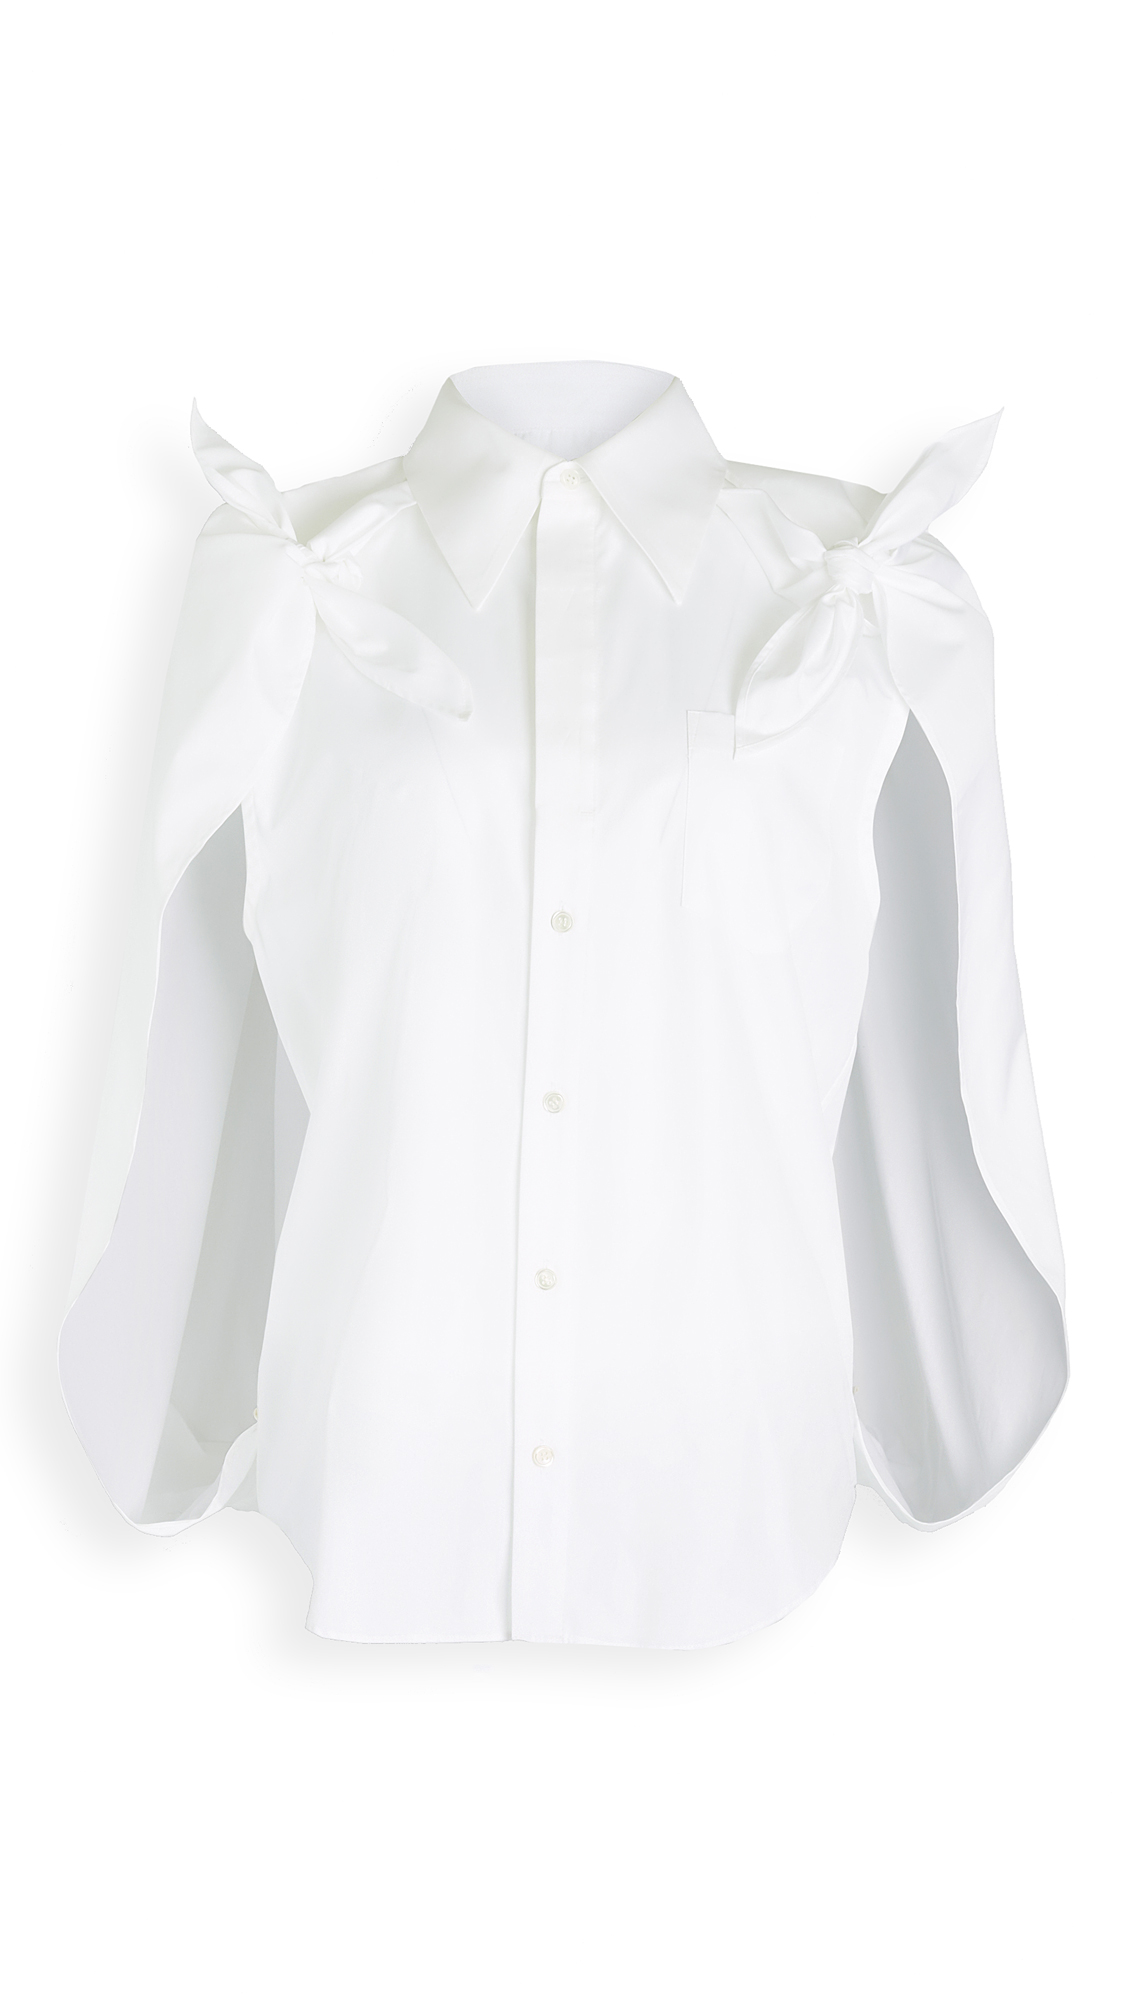 Toga Pulla Cotton Shirt Cape